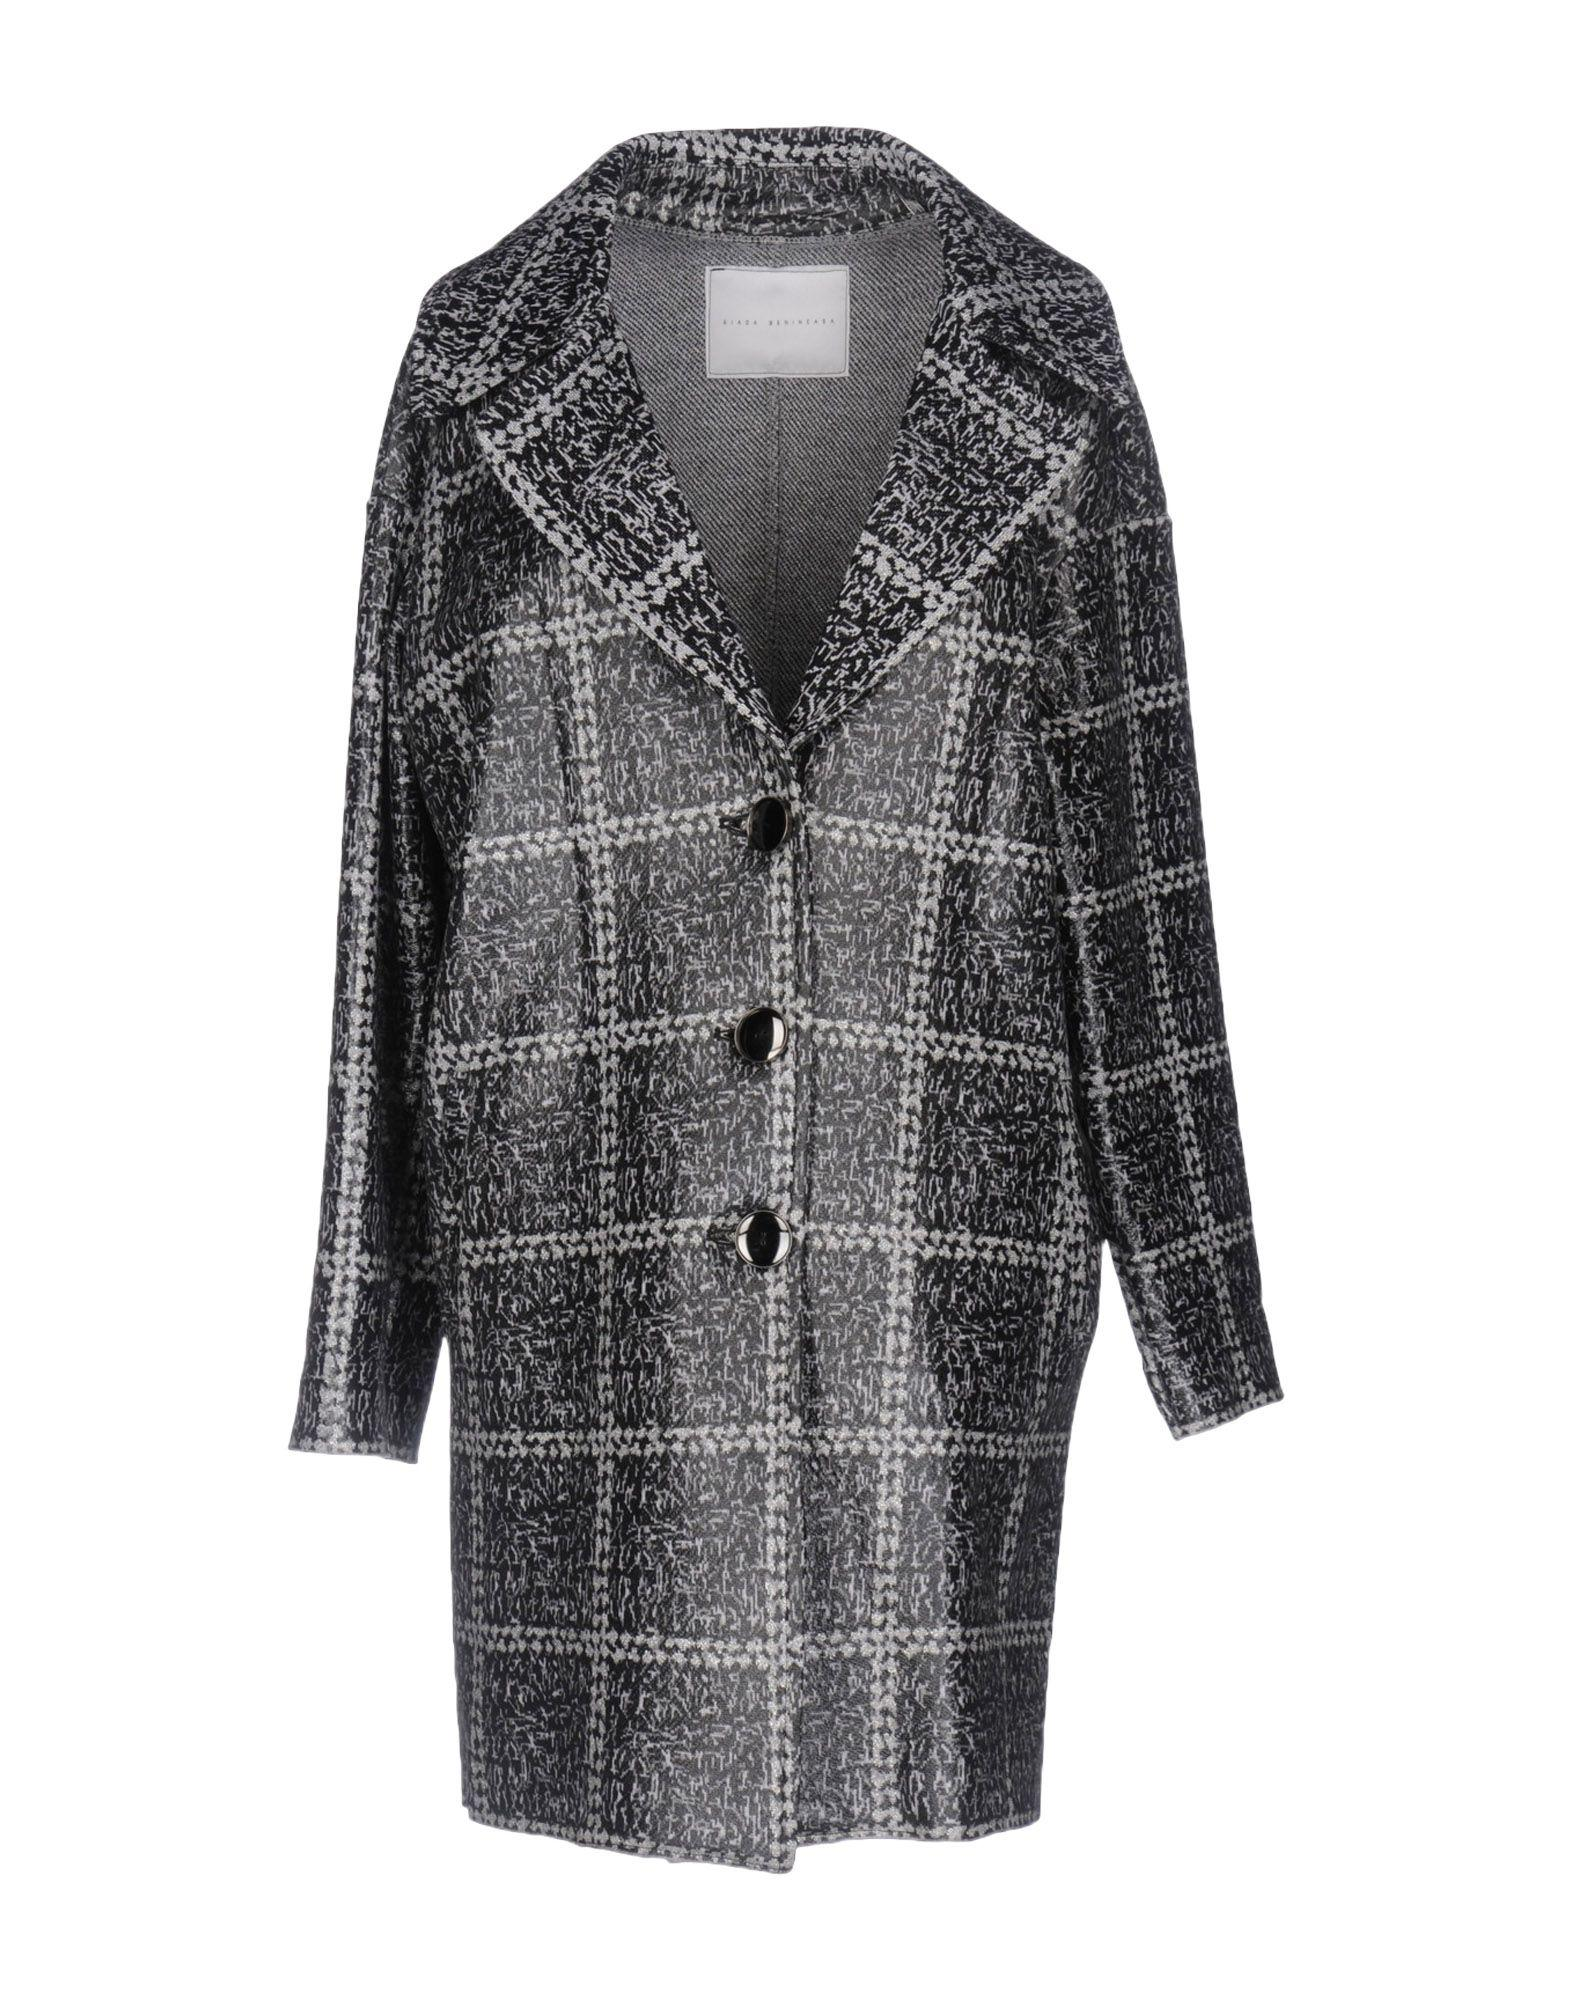 COATS & JACKETS - Overcoats su YOOX.COM Giada Benincasa 2018 Unisex Online Buy Cheap For Sale Good Selling Sale Online Cheap Sale Recommend PI91zhD1o8